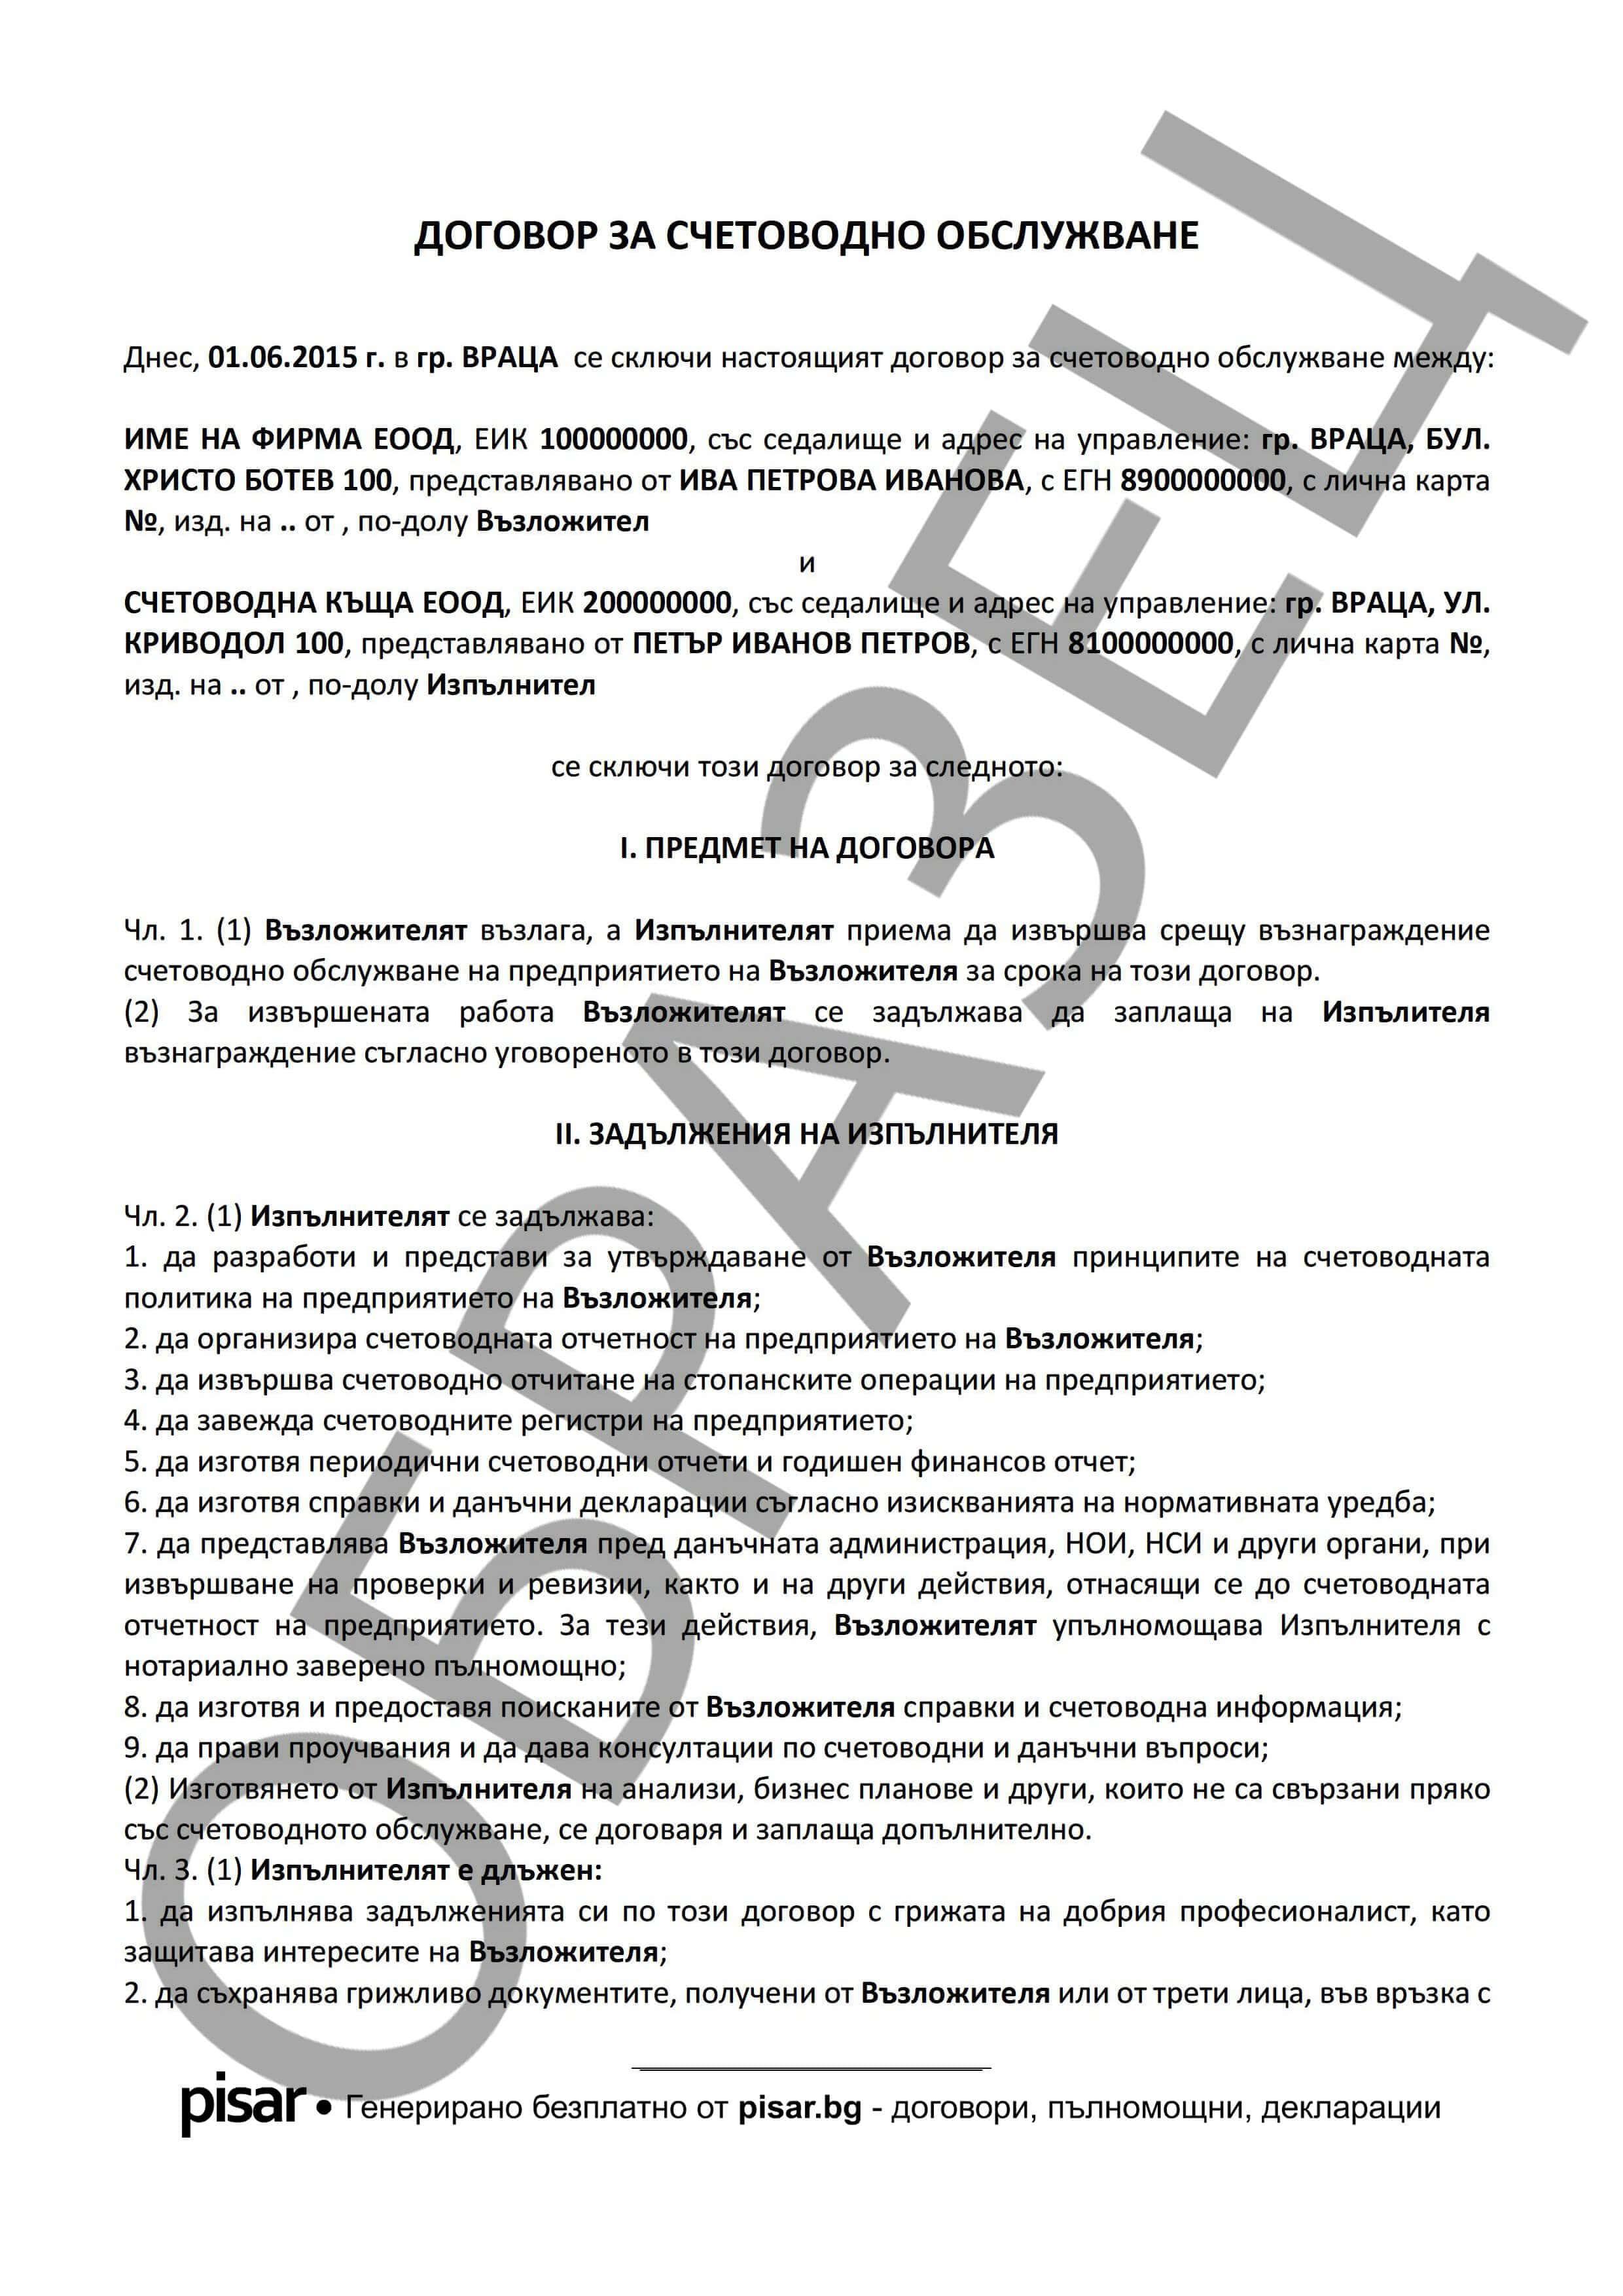 Примерен документ Договор за счетоводно обслужване